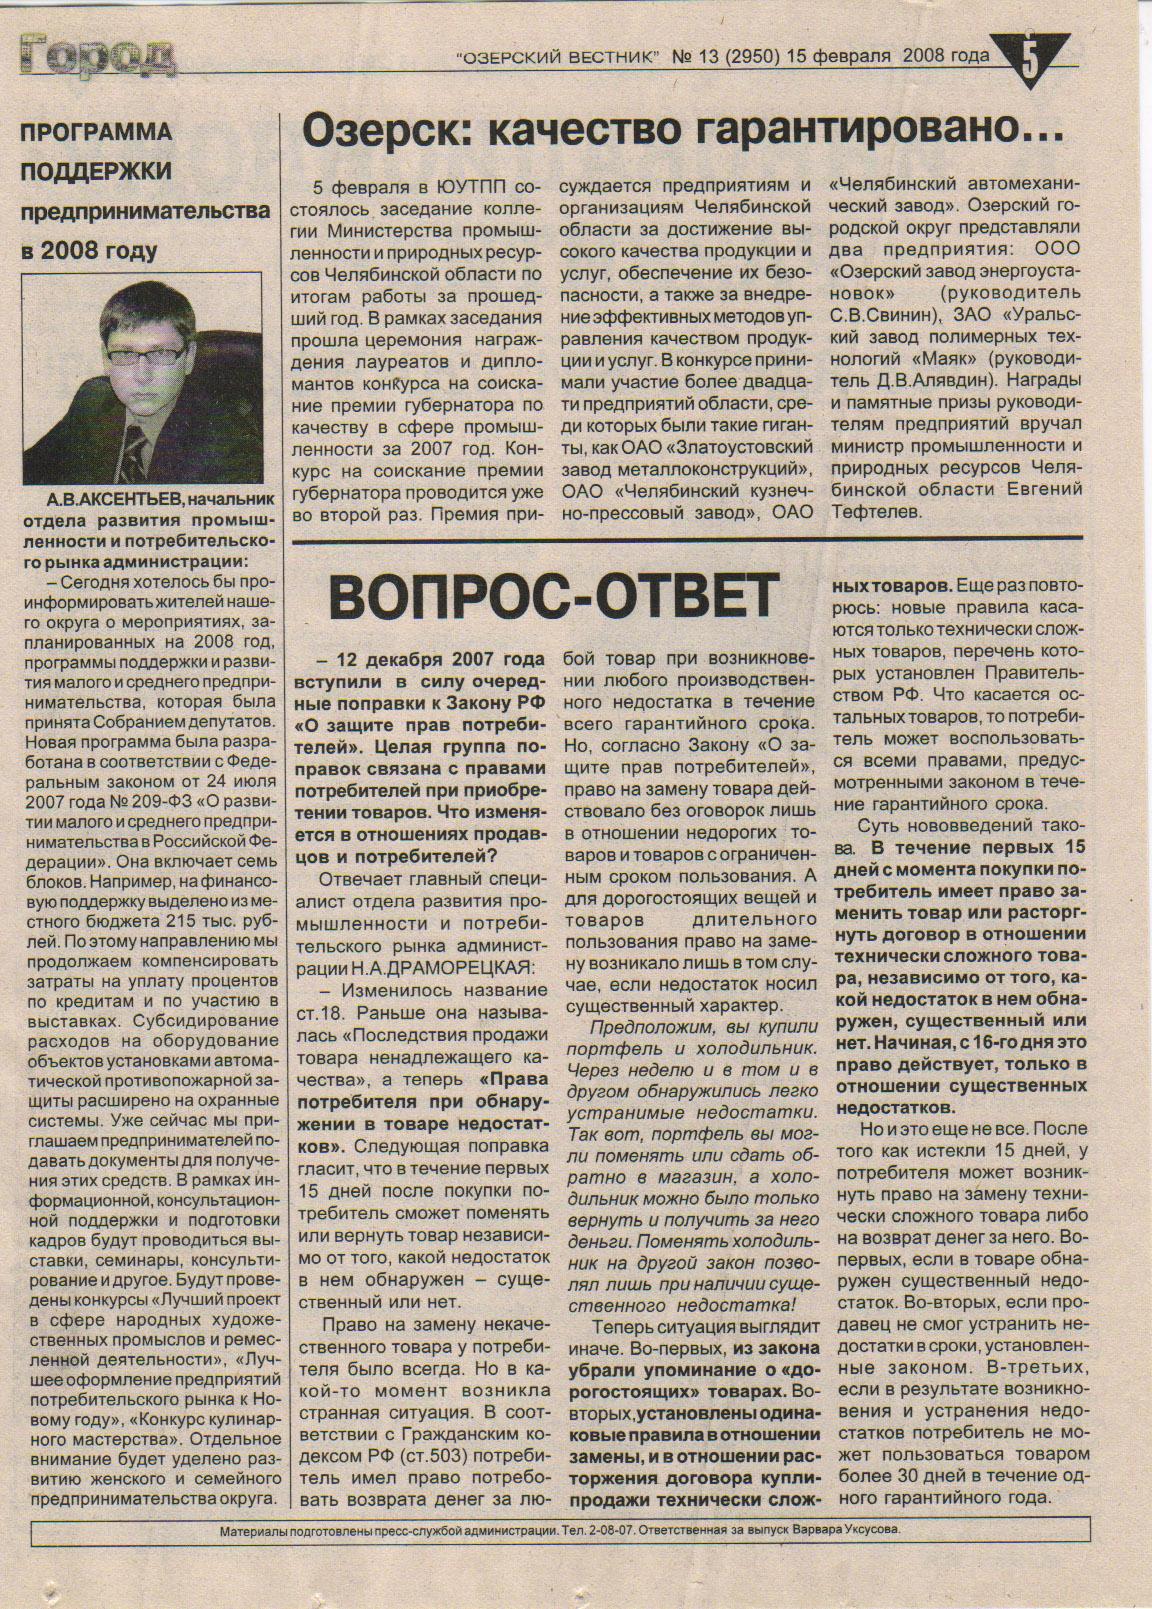 zolotoj-merkurij-luchshemu-predpriyatiyu